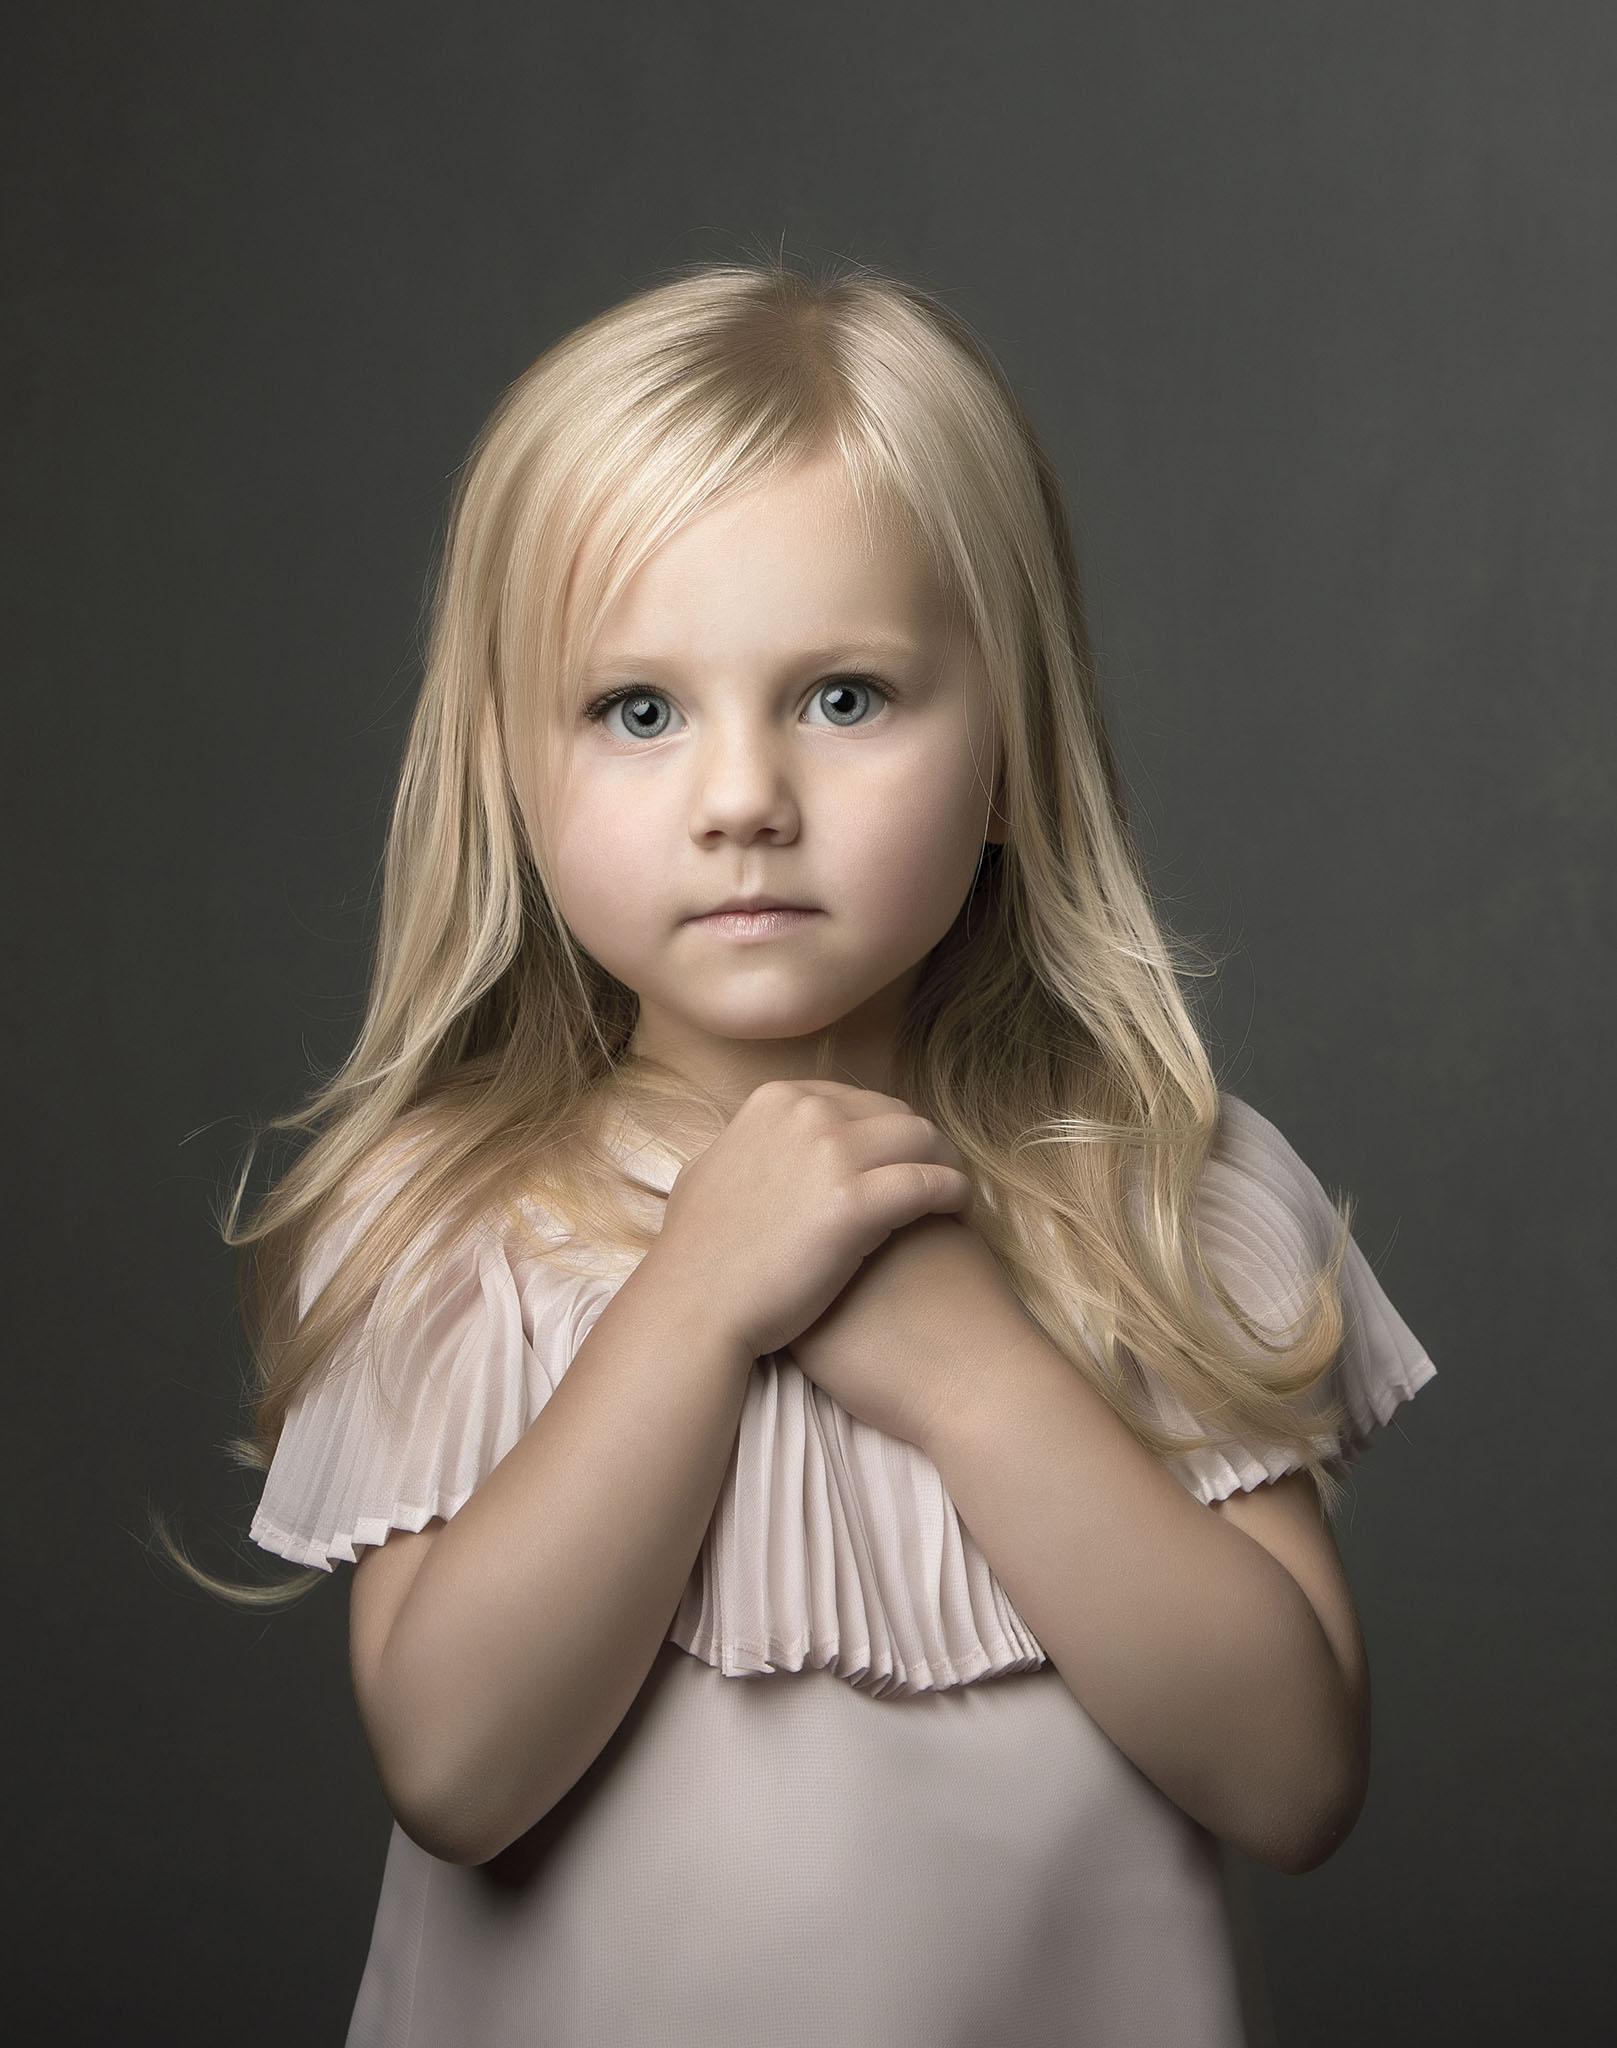 elizabethgphotography_kingslangley_hertfordshire_fineart_childrens_photography_26.jpg